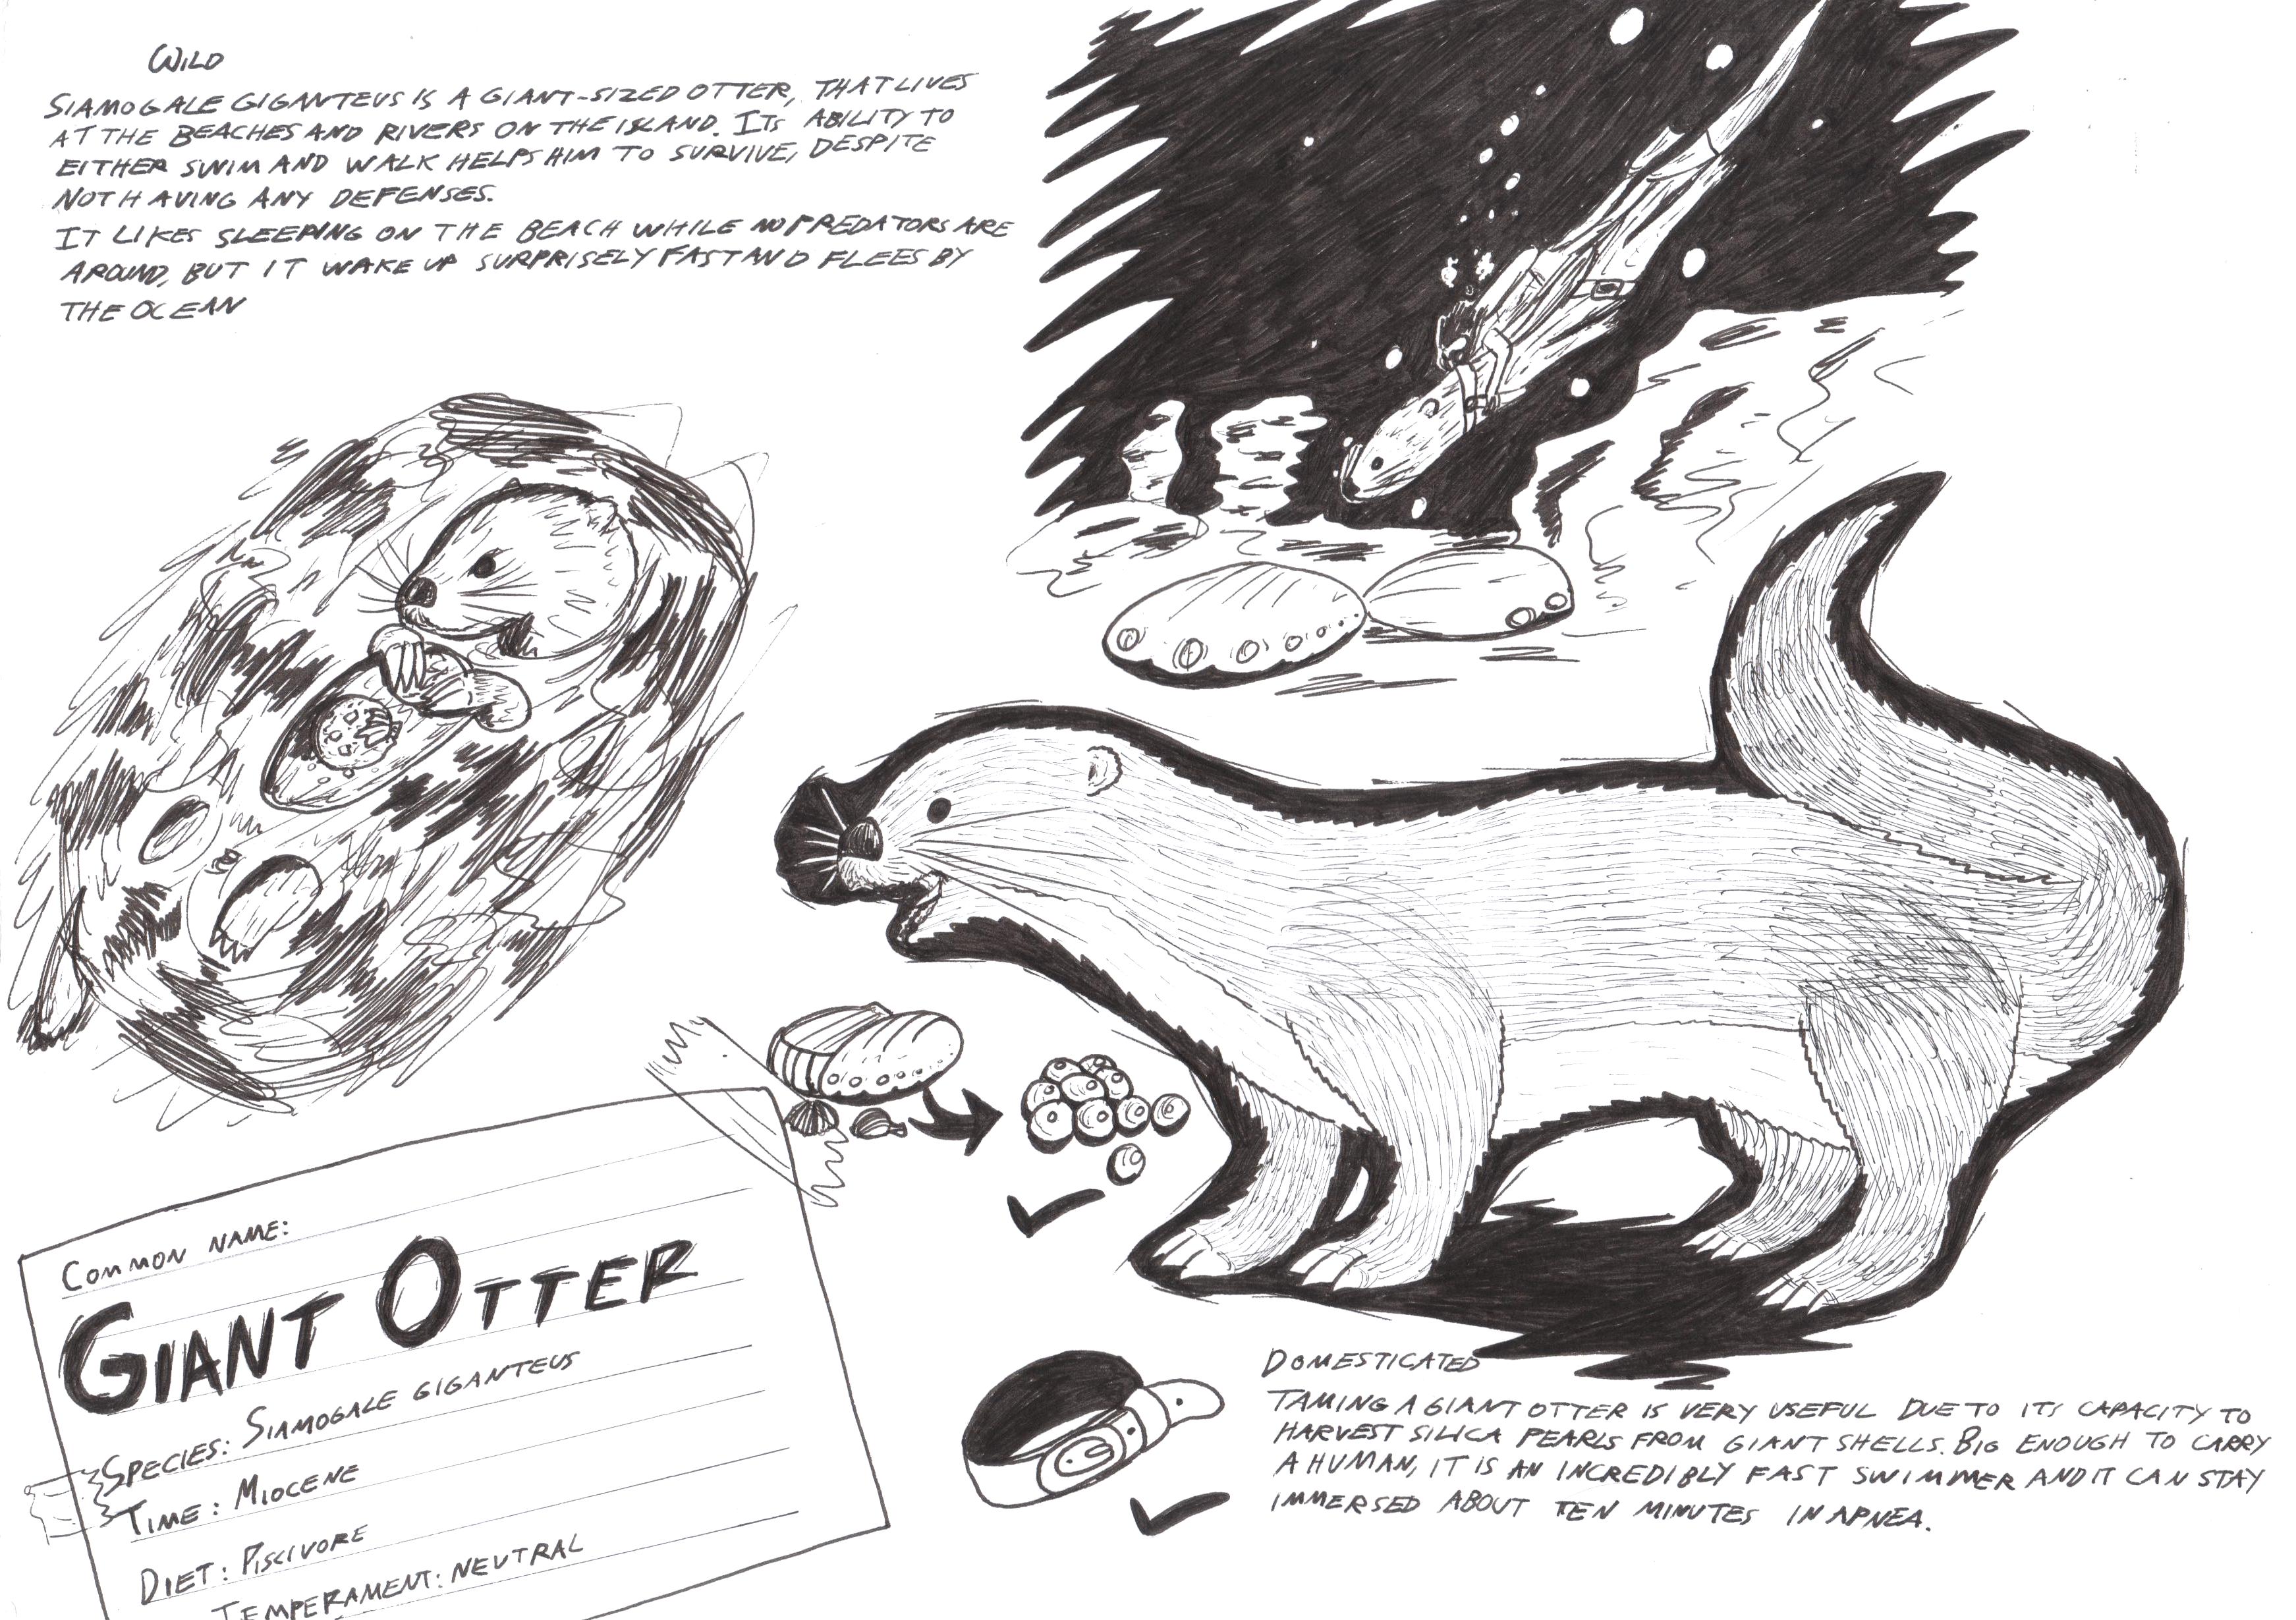 steam community siamogale giant otter dino dossier. Black Bedroom Furniture Sets. Home Design Ideas